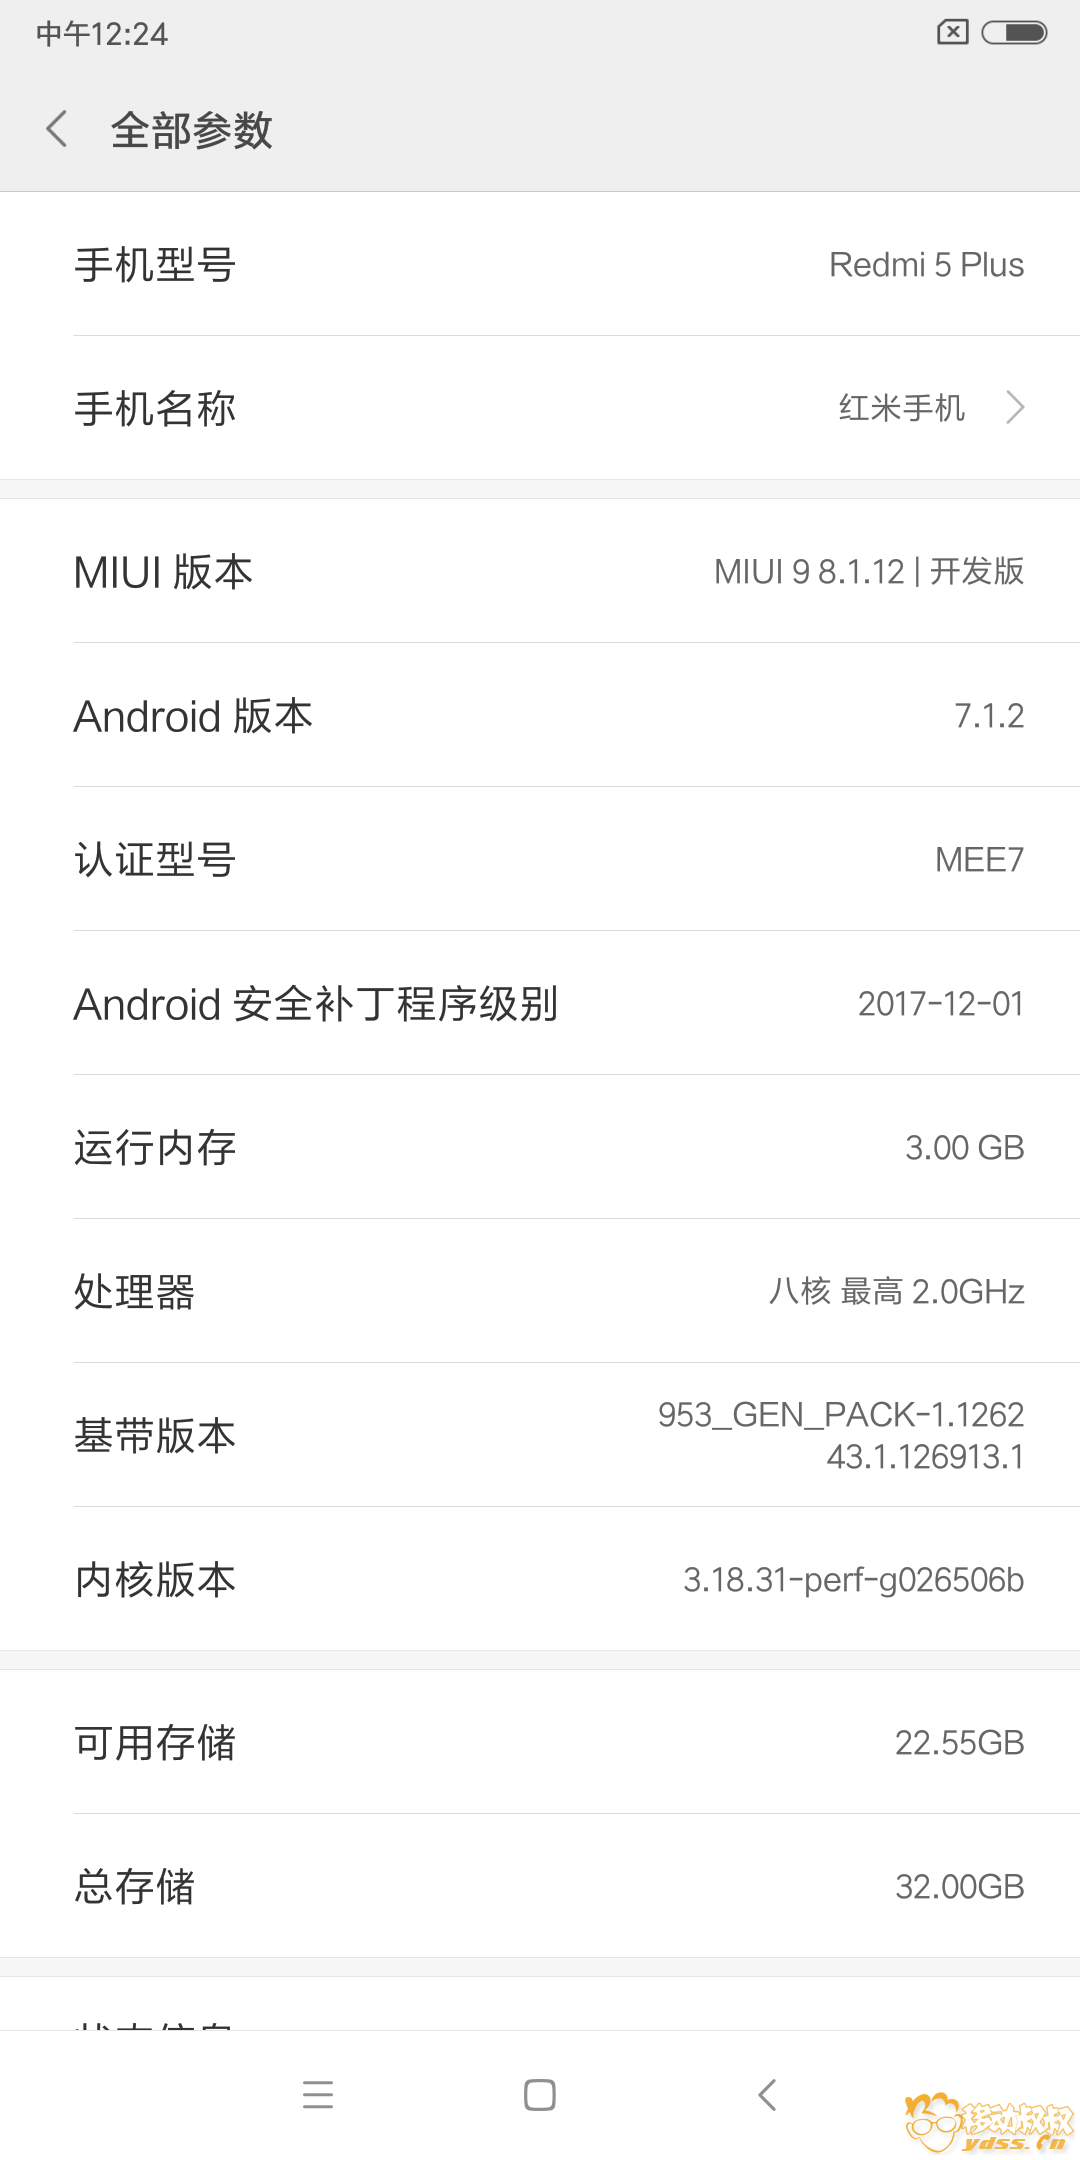 Screenshot_2018-01-12-12-24-31-482_com.android.settings.png